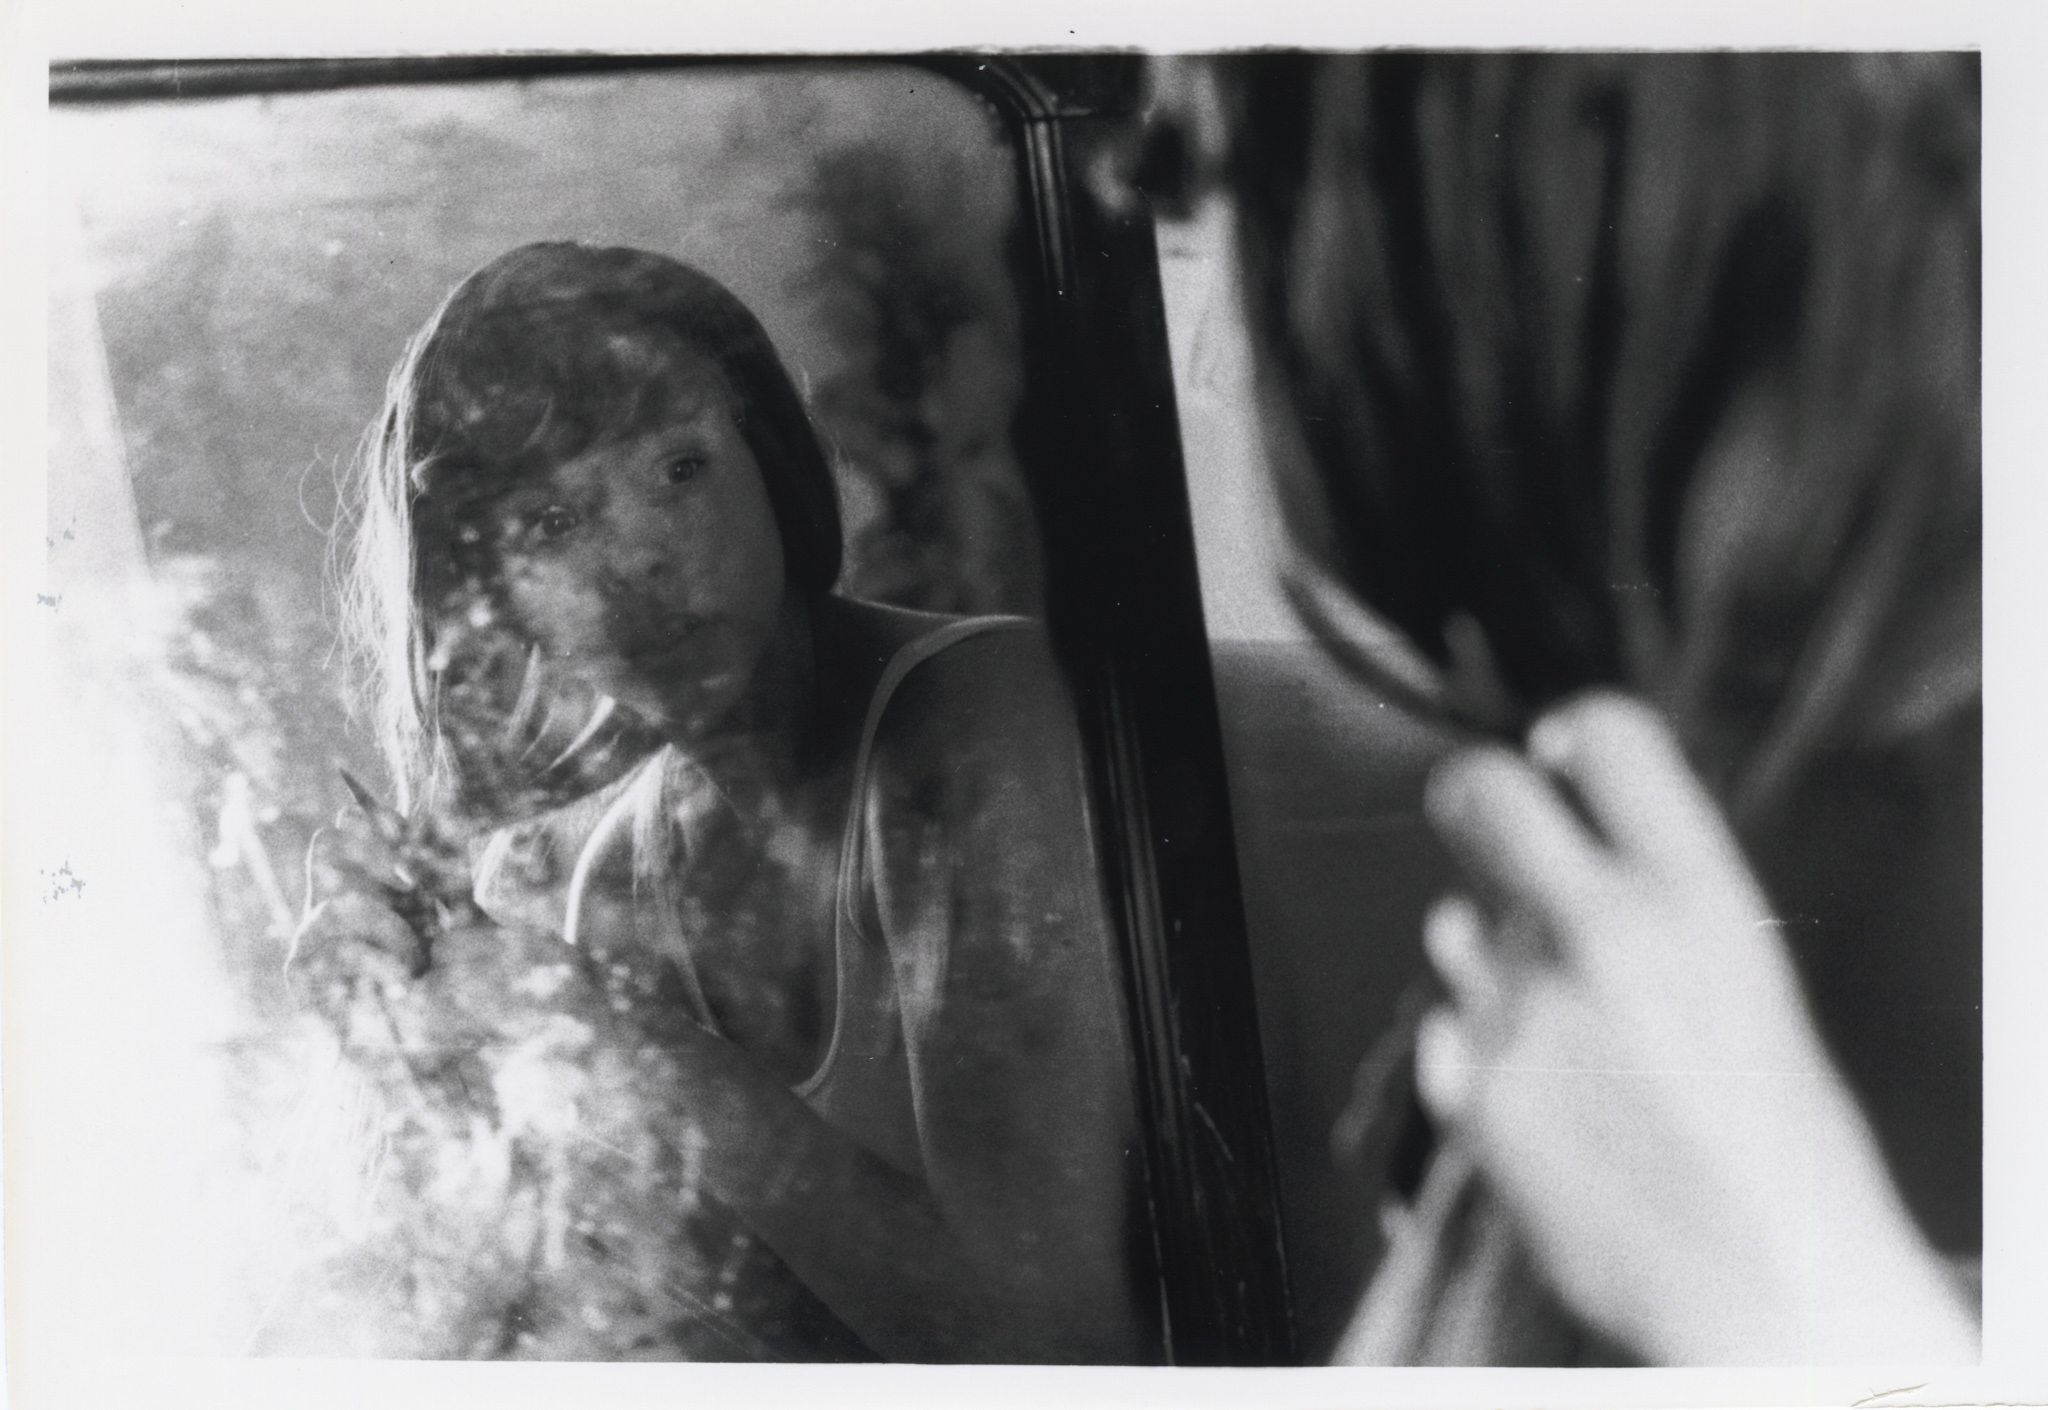 Model: Paige Wolcott  Camera: Nikon F100  Film: HP5+ 35mm  Photo Paper: Unknown